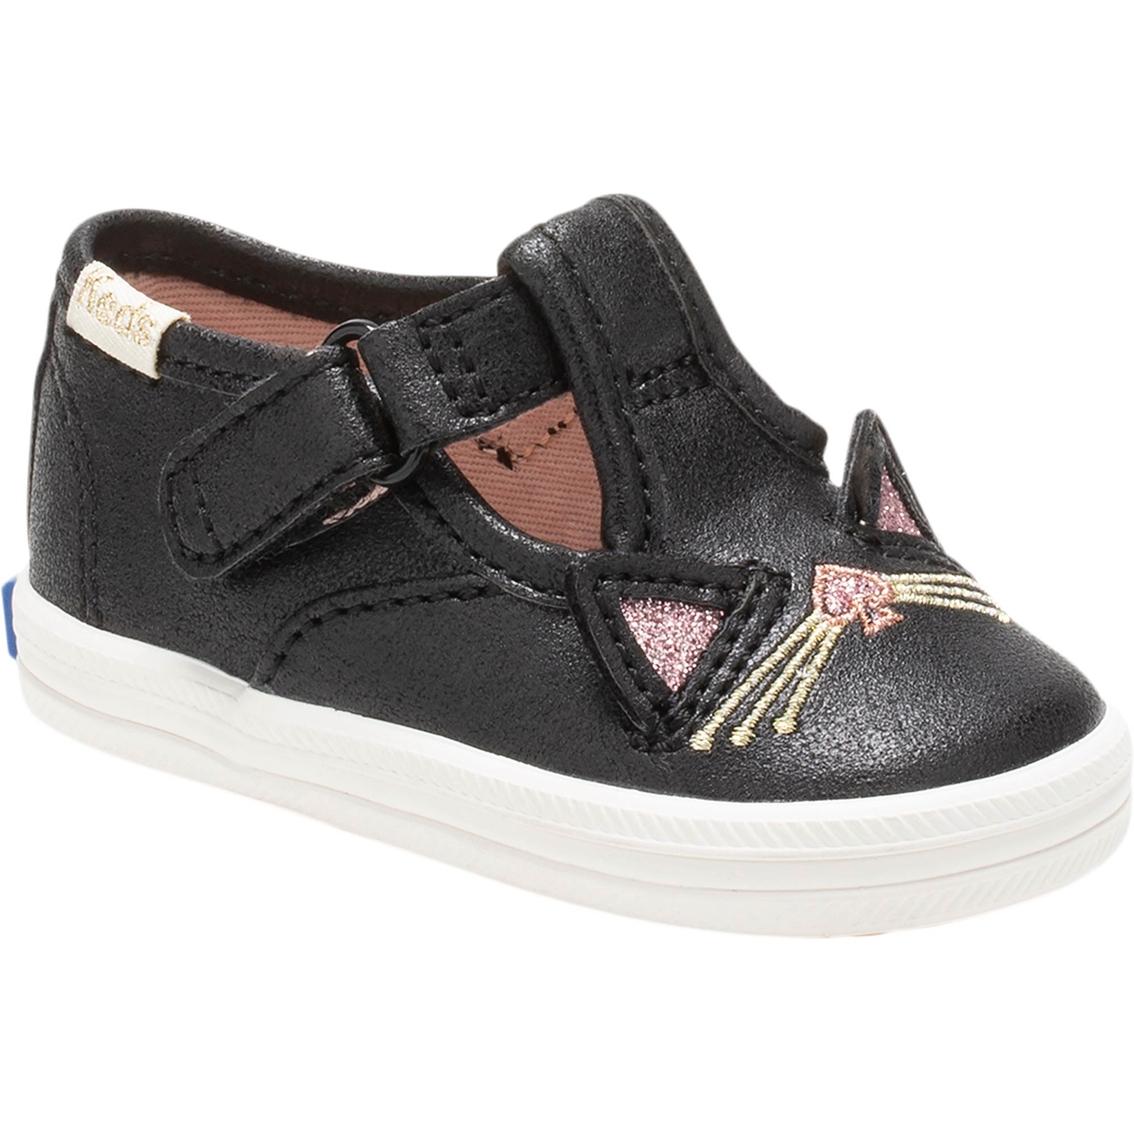 943c4082574 Keds For Kate Spade Infant Girls Hayden Cat Crib Sneakers